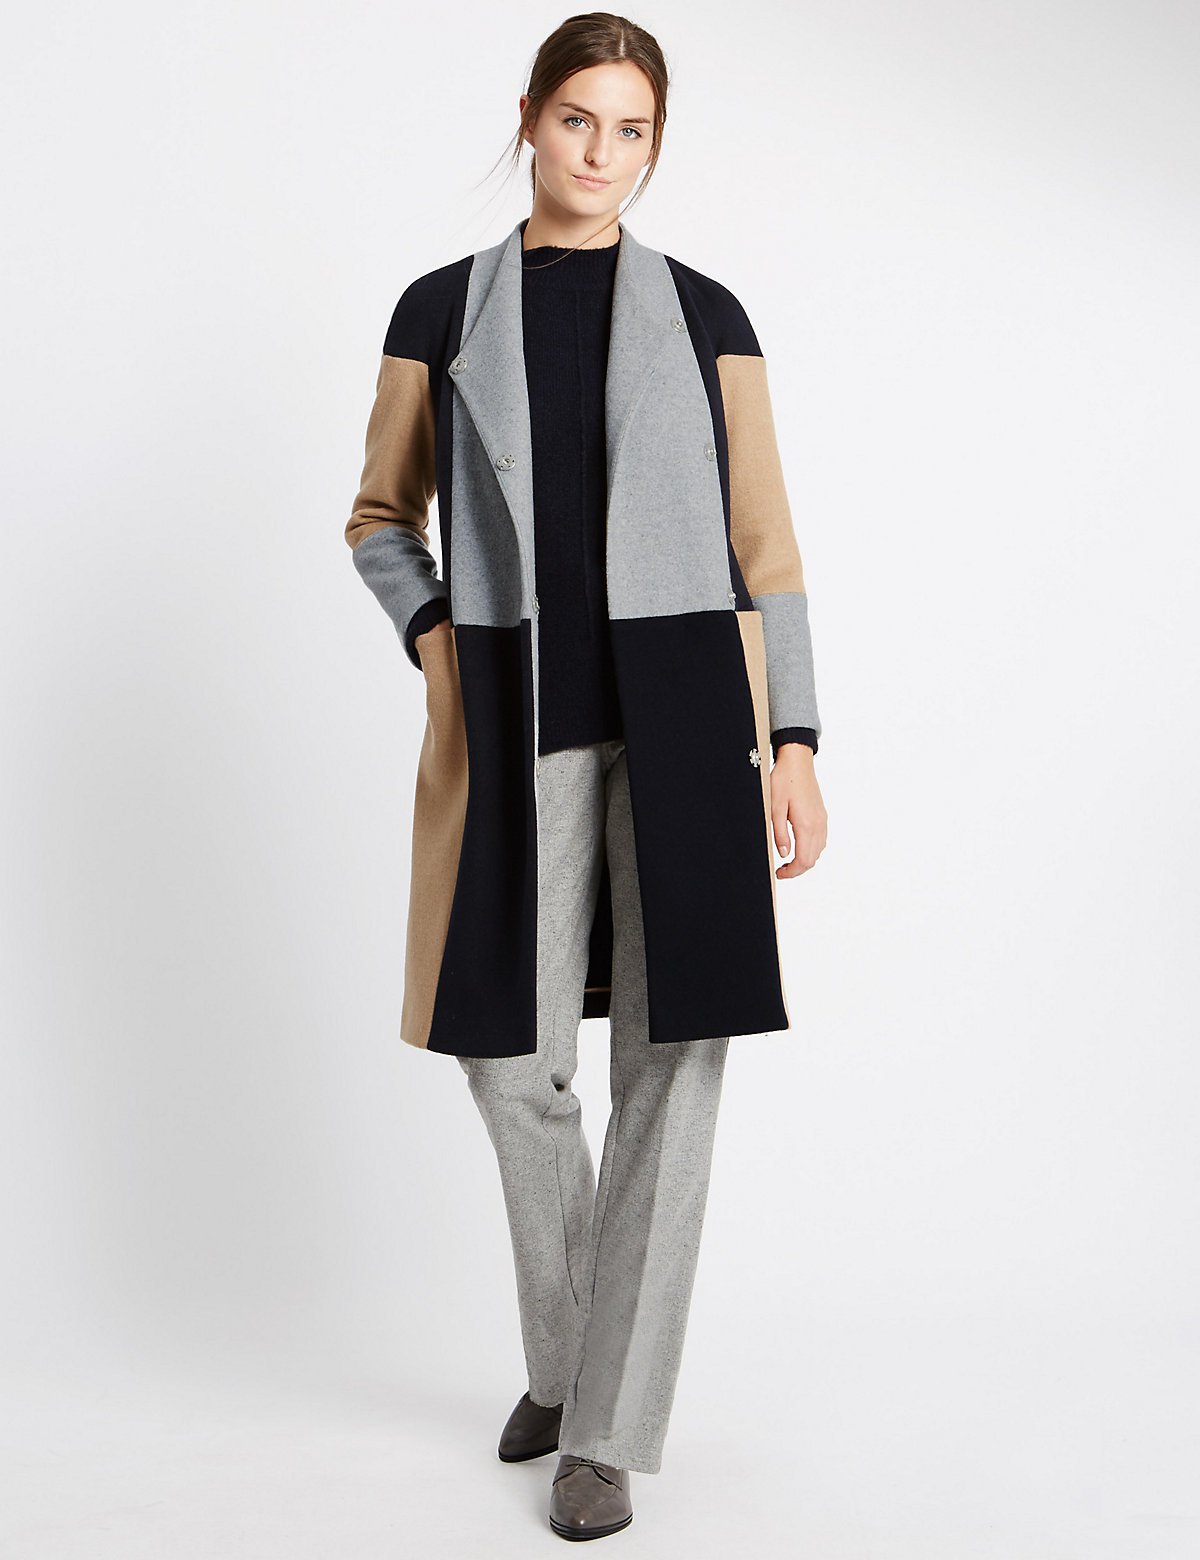 M&s Collection Colour Block Check Blanket Coat